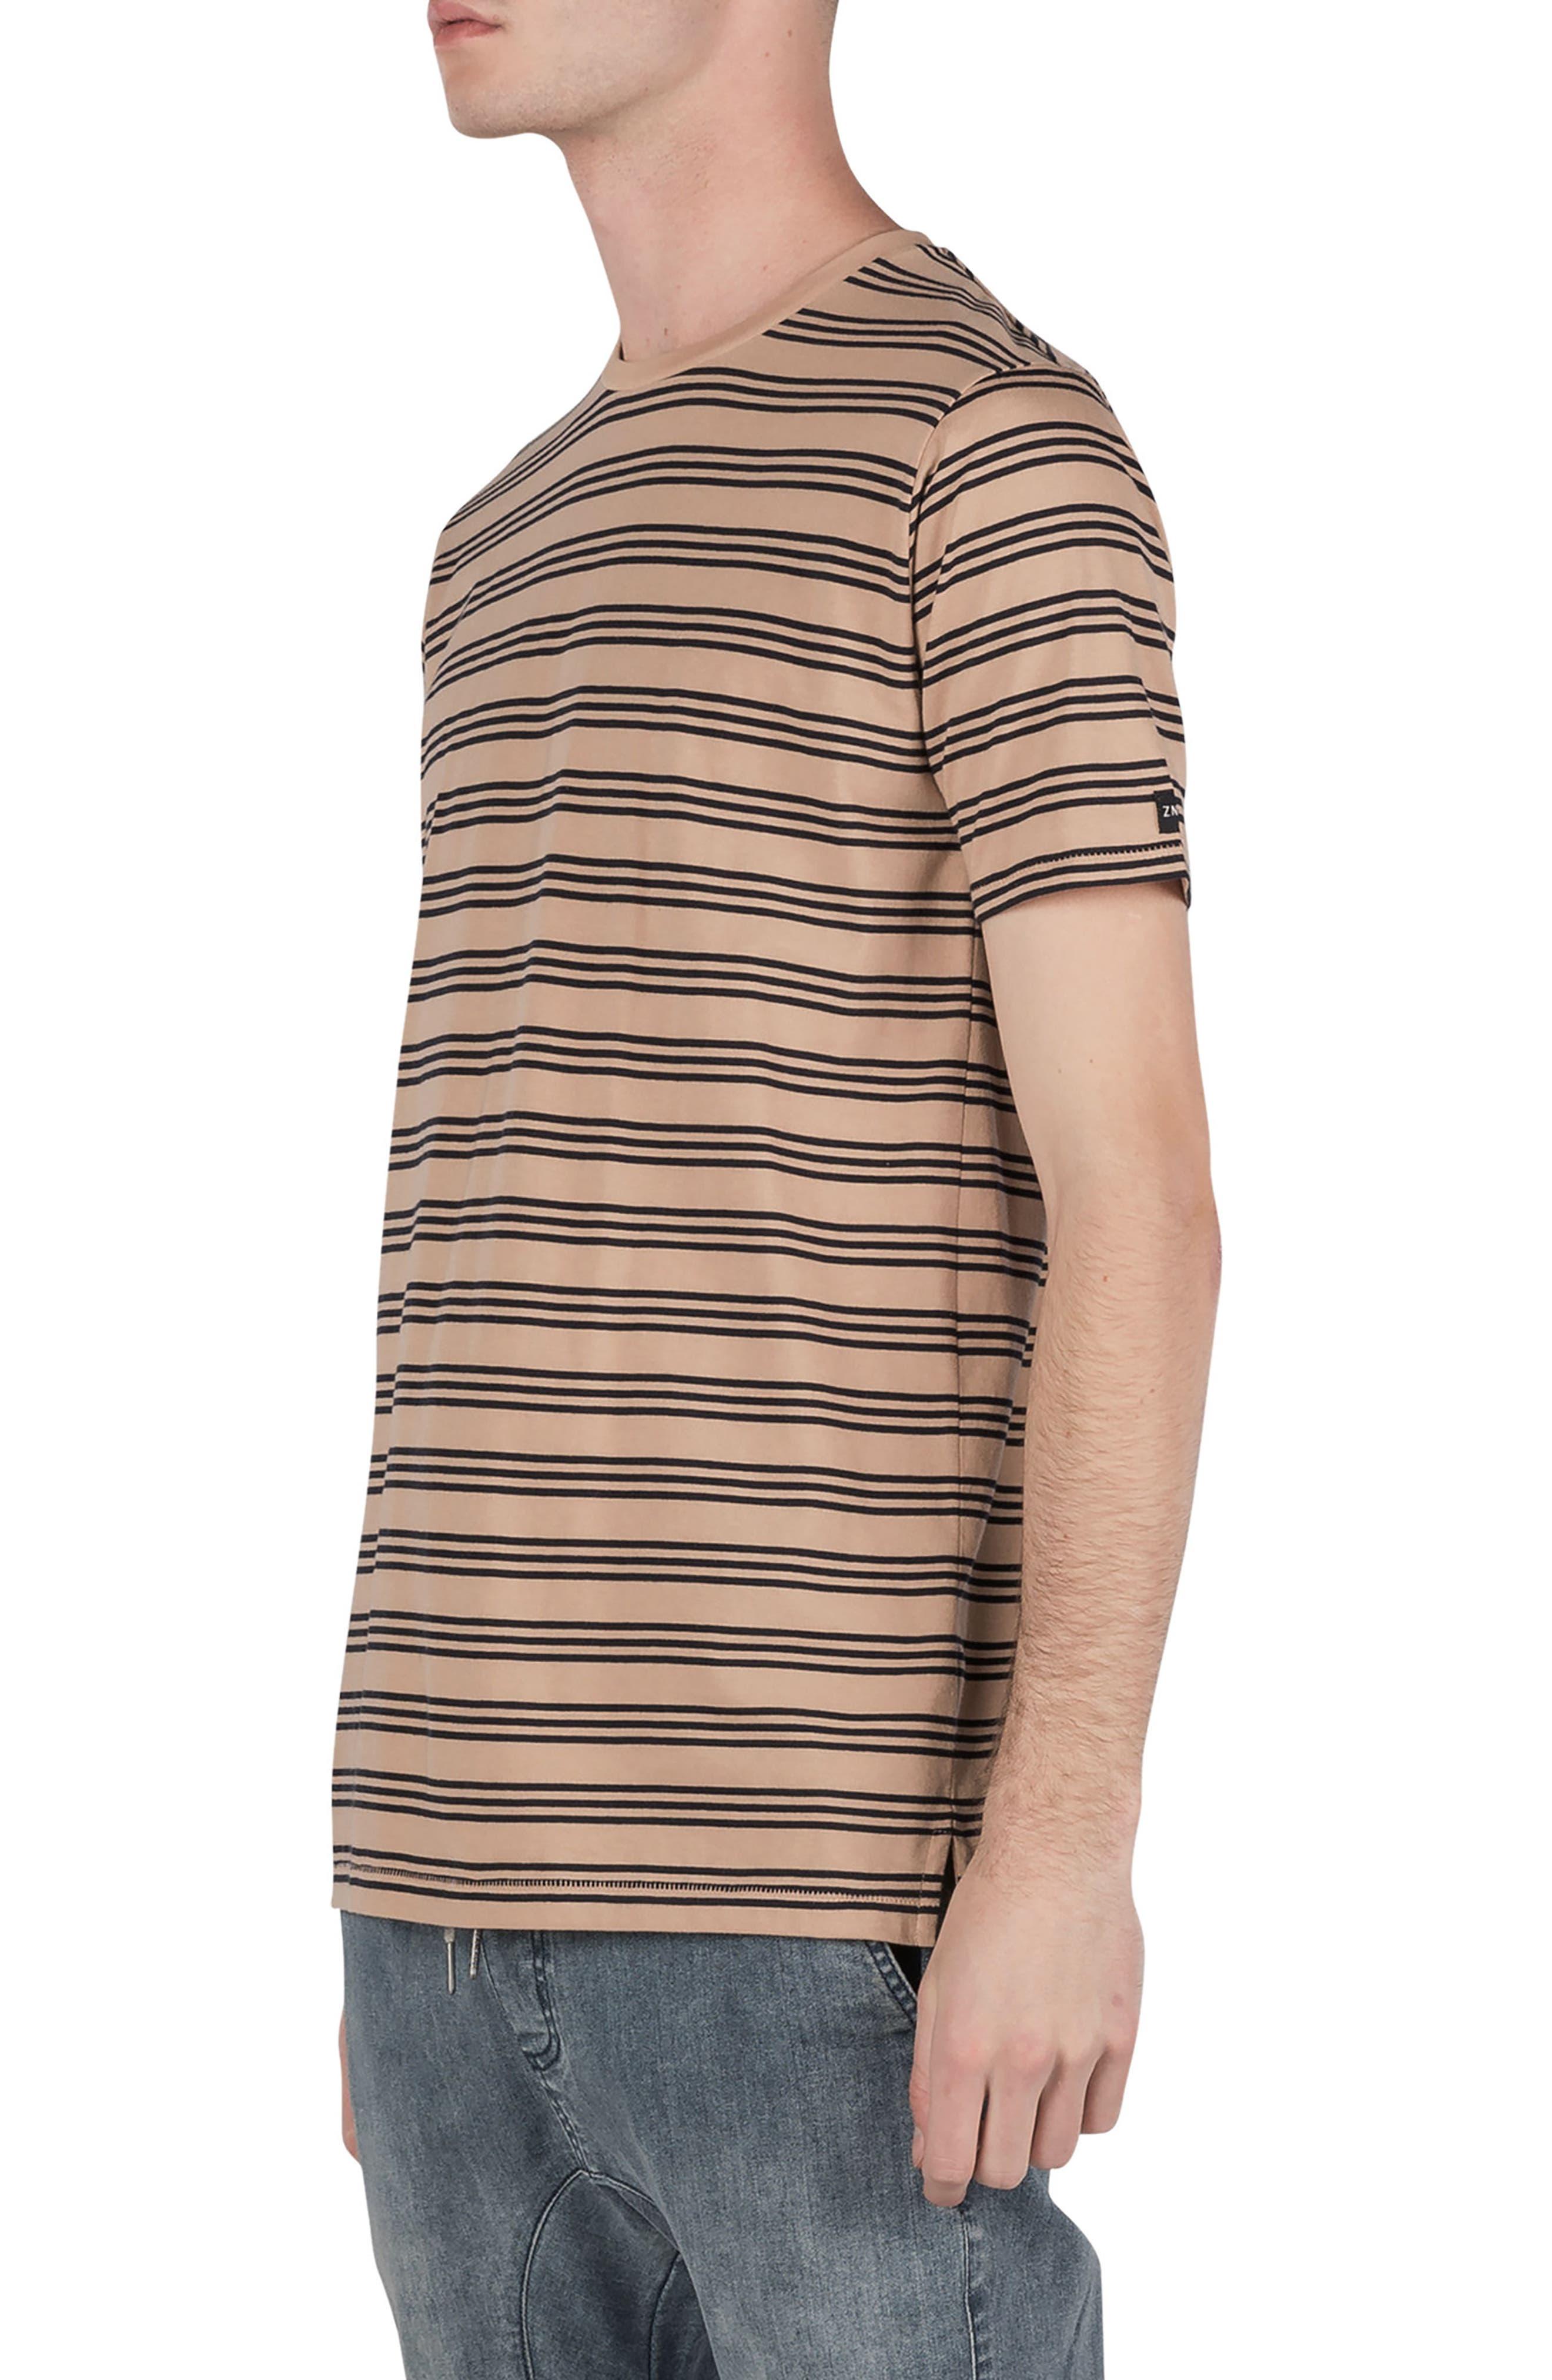 Flintlock Stripe T-Shirt,                             Alternate thumbnail 4, color,                             Wheat/ Navy